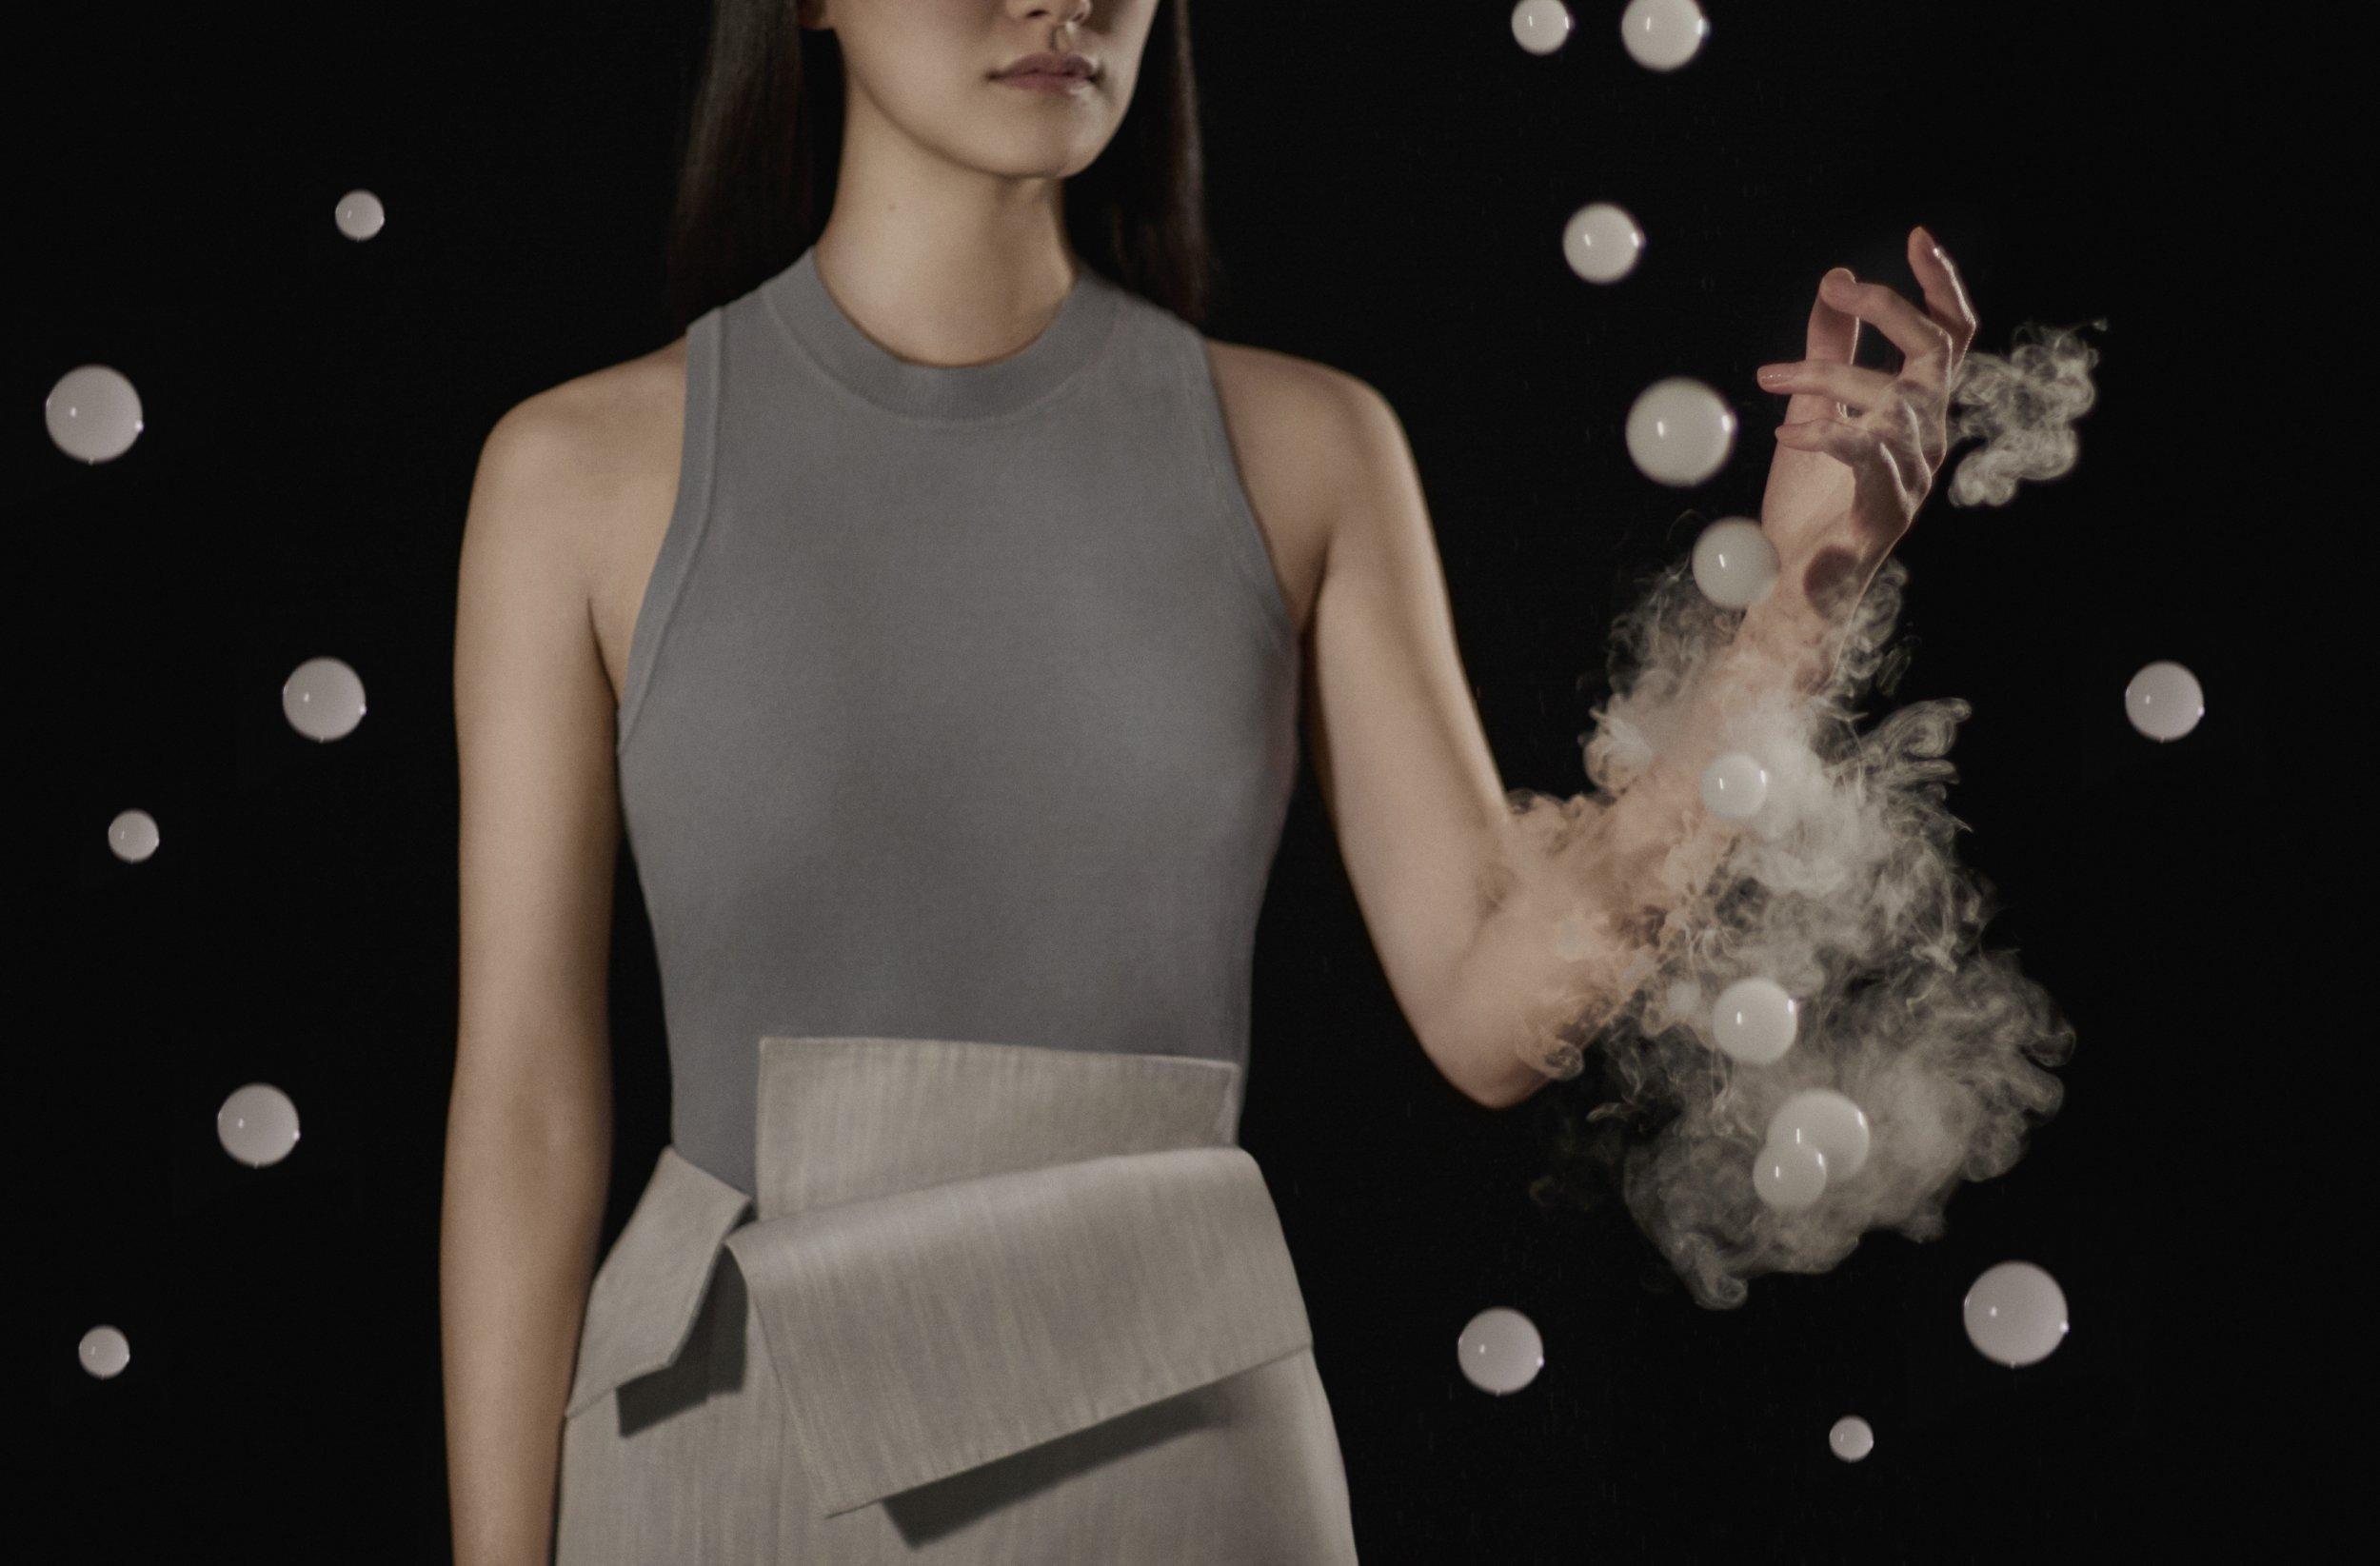 Bubbles burst on a model